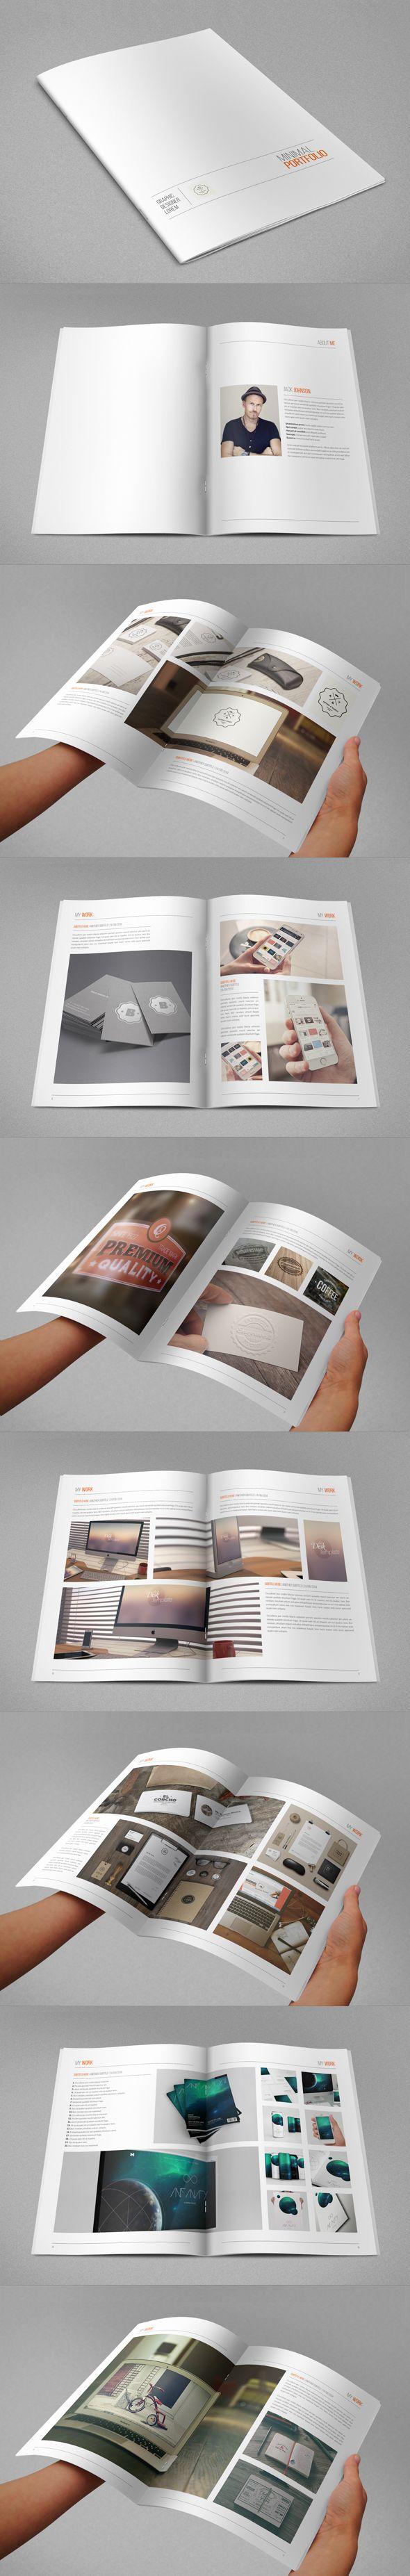 Minimal Hipster Design Portfolio 2 by Abra Design, via Behance